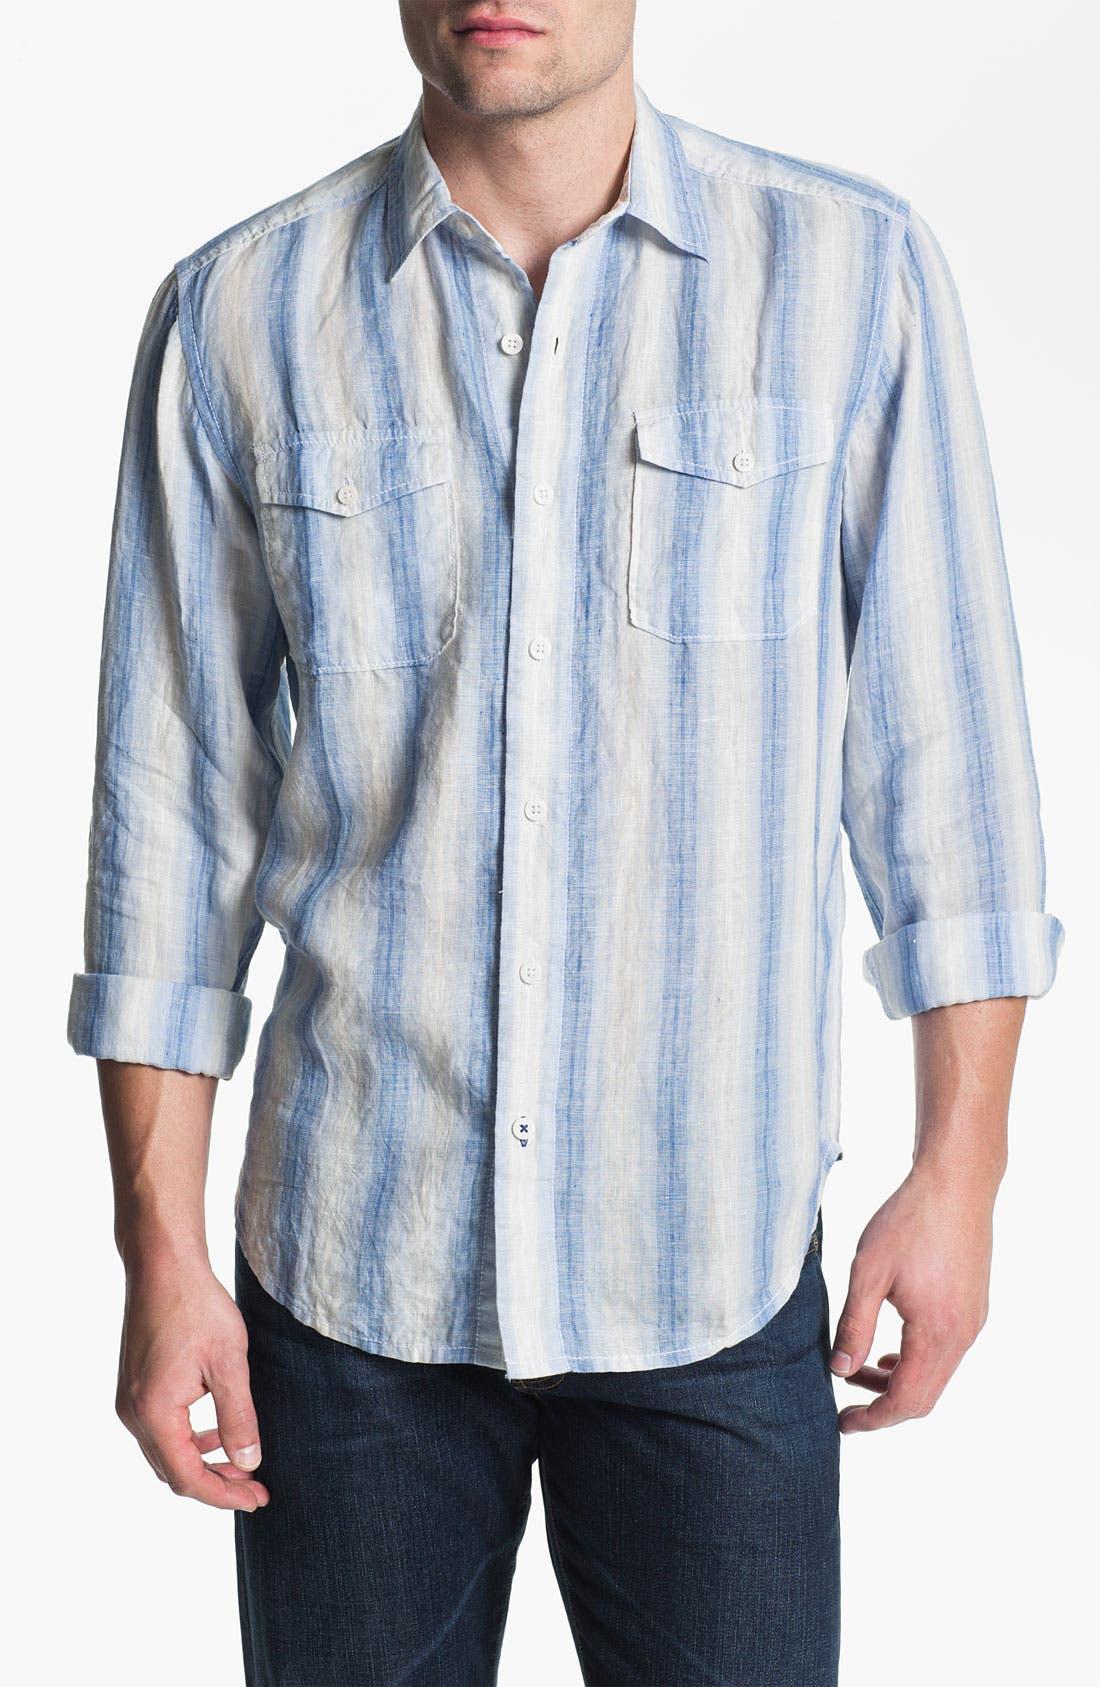 Main Image - Tommy Bahama 'Eastern Seaboard' Linen Sport Shirt (Big & Tall)